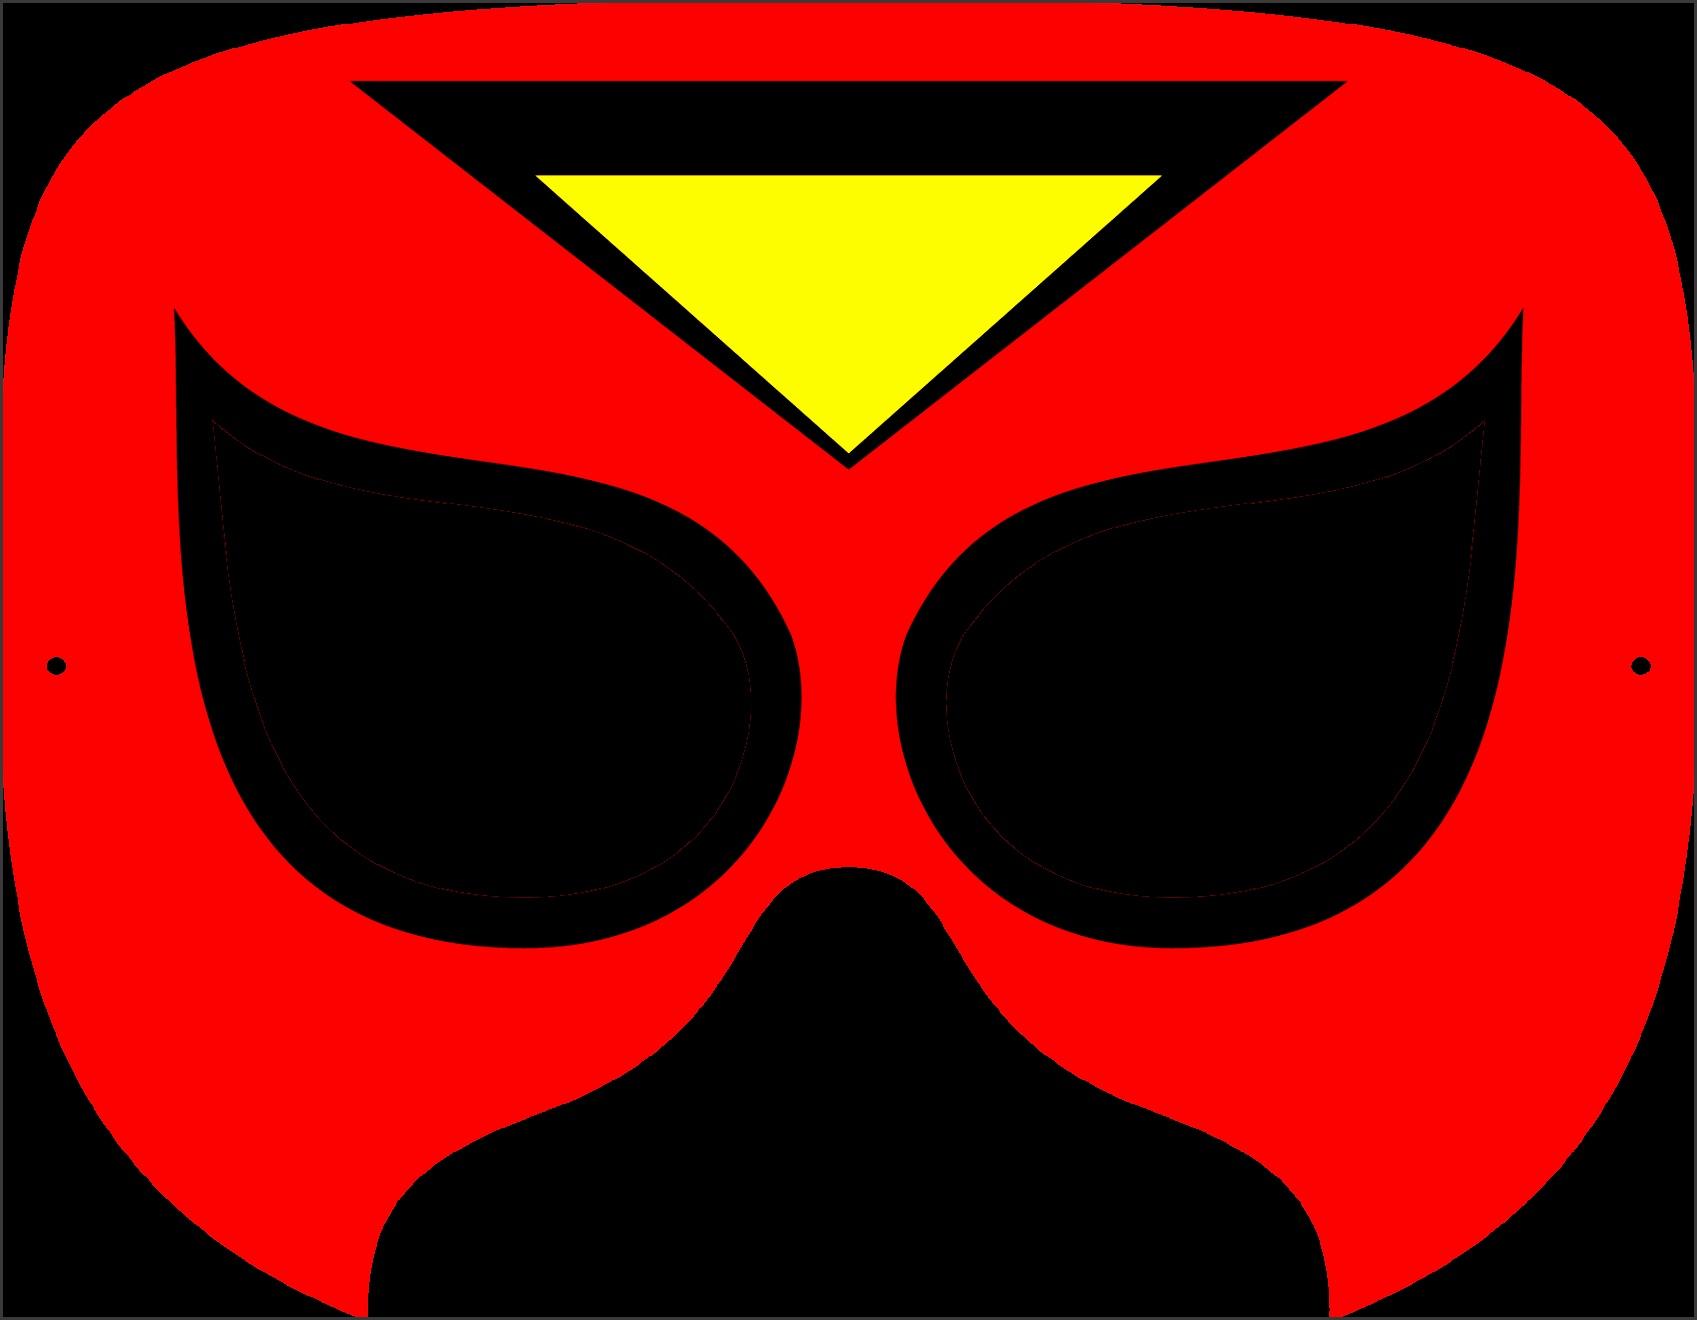 xprintable superhero mask spiderwoman gespeed ic gQEoJIfkwK